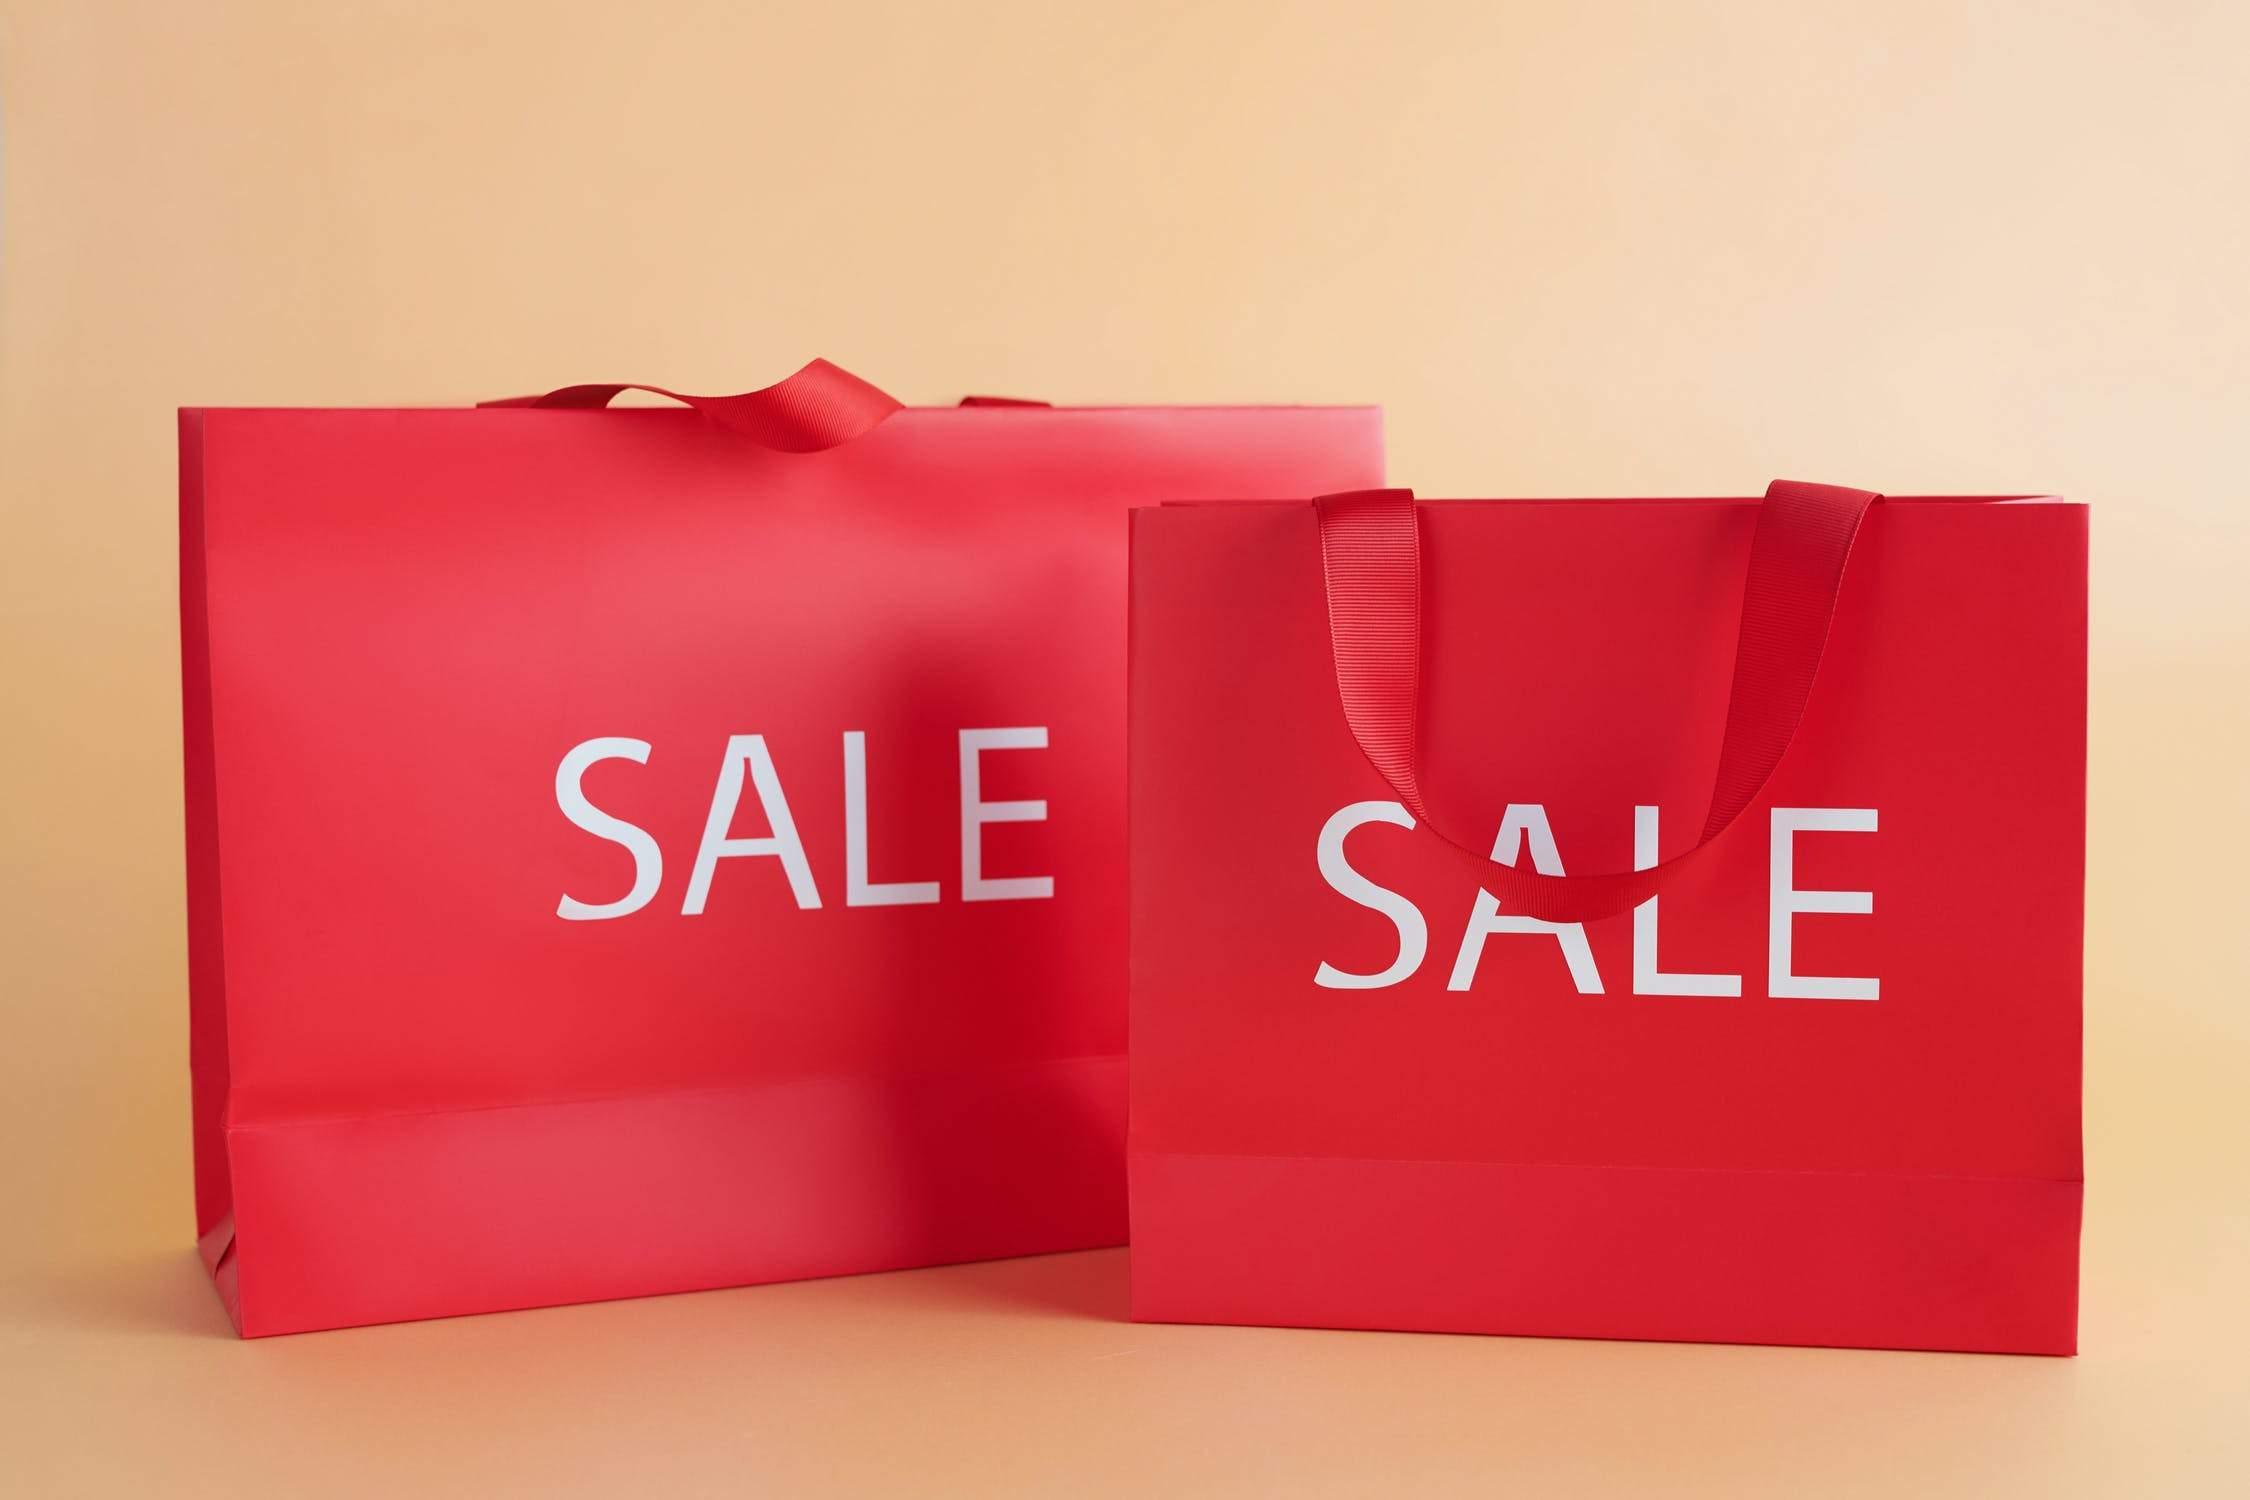 christmas sale, 2020, yescomusa, deal, shop online